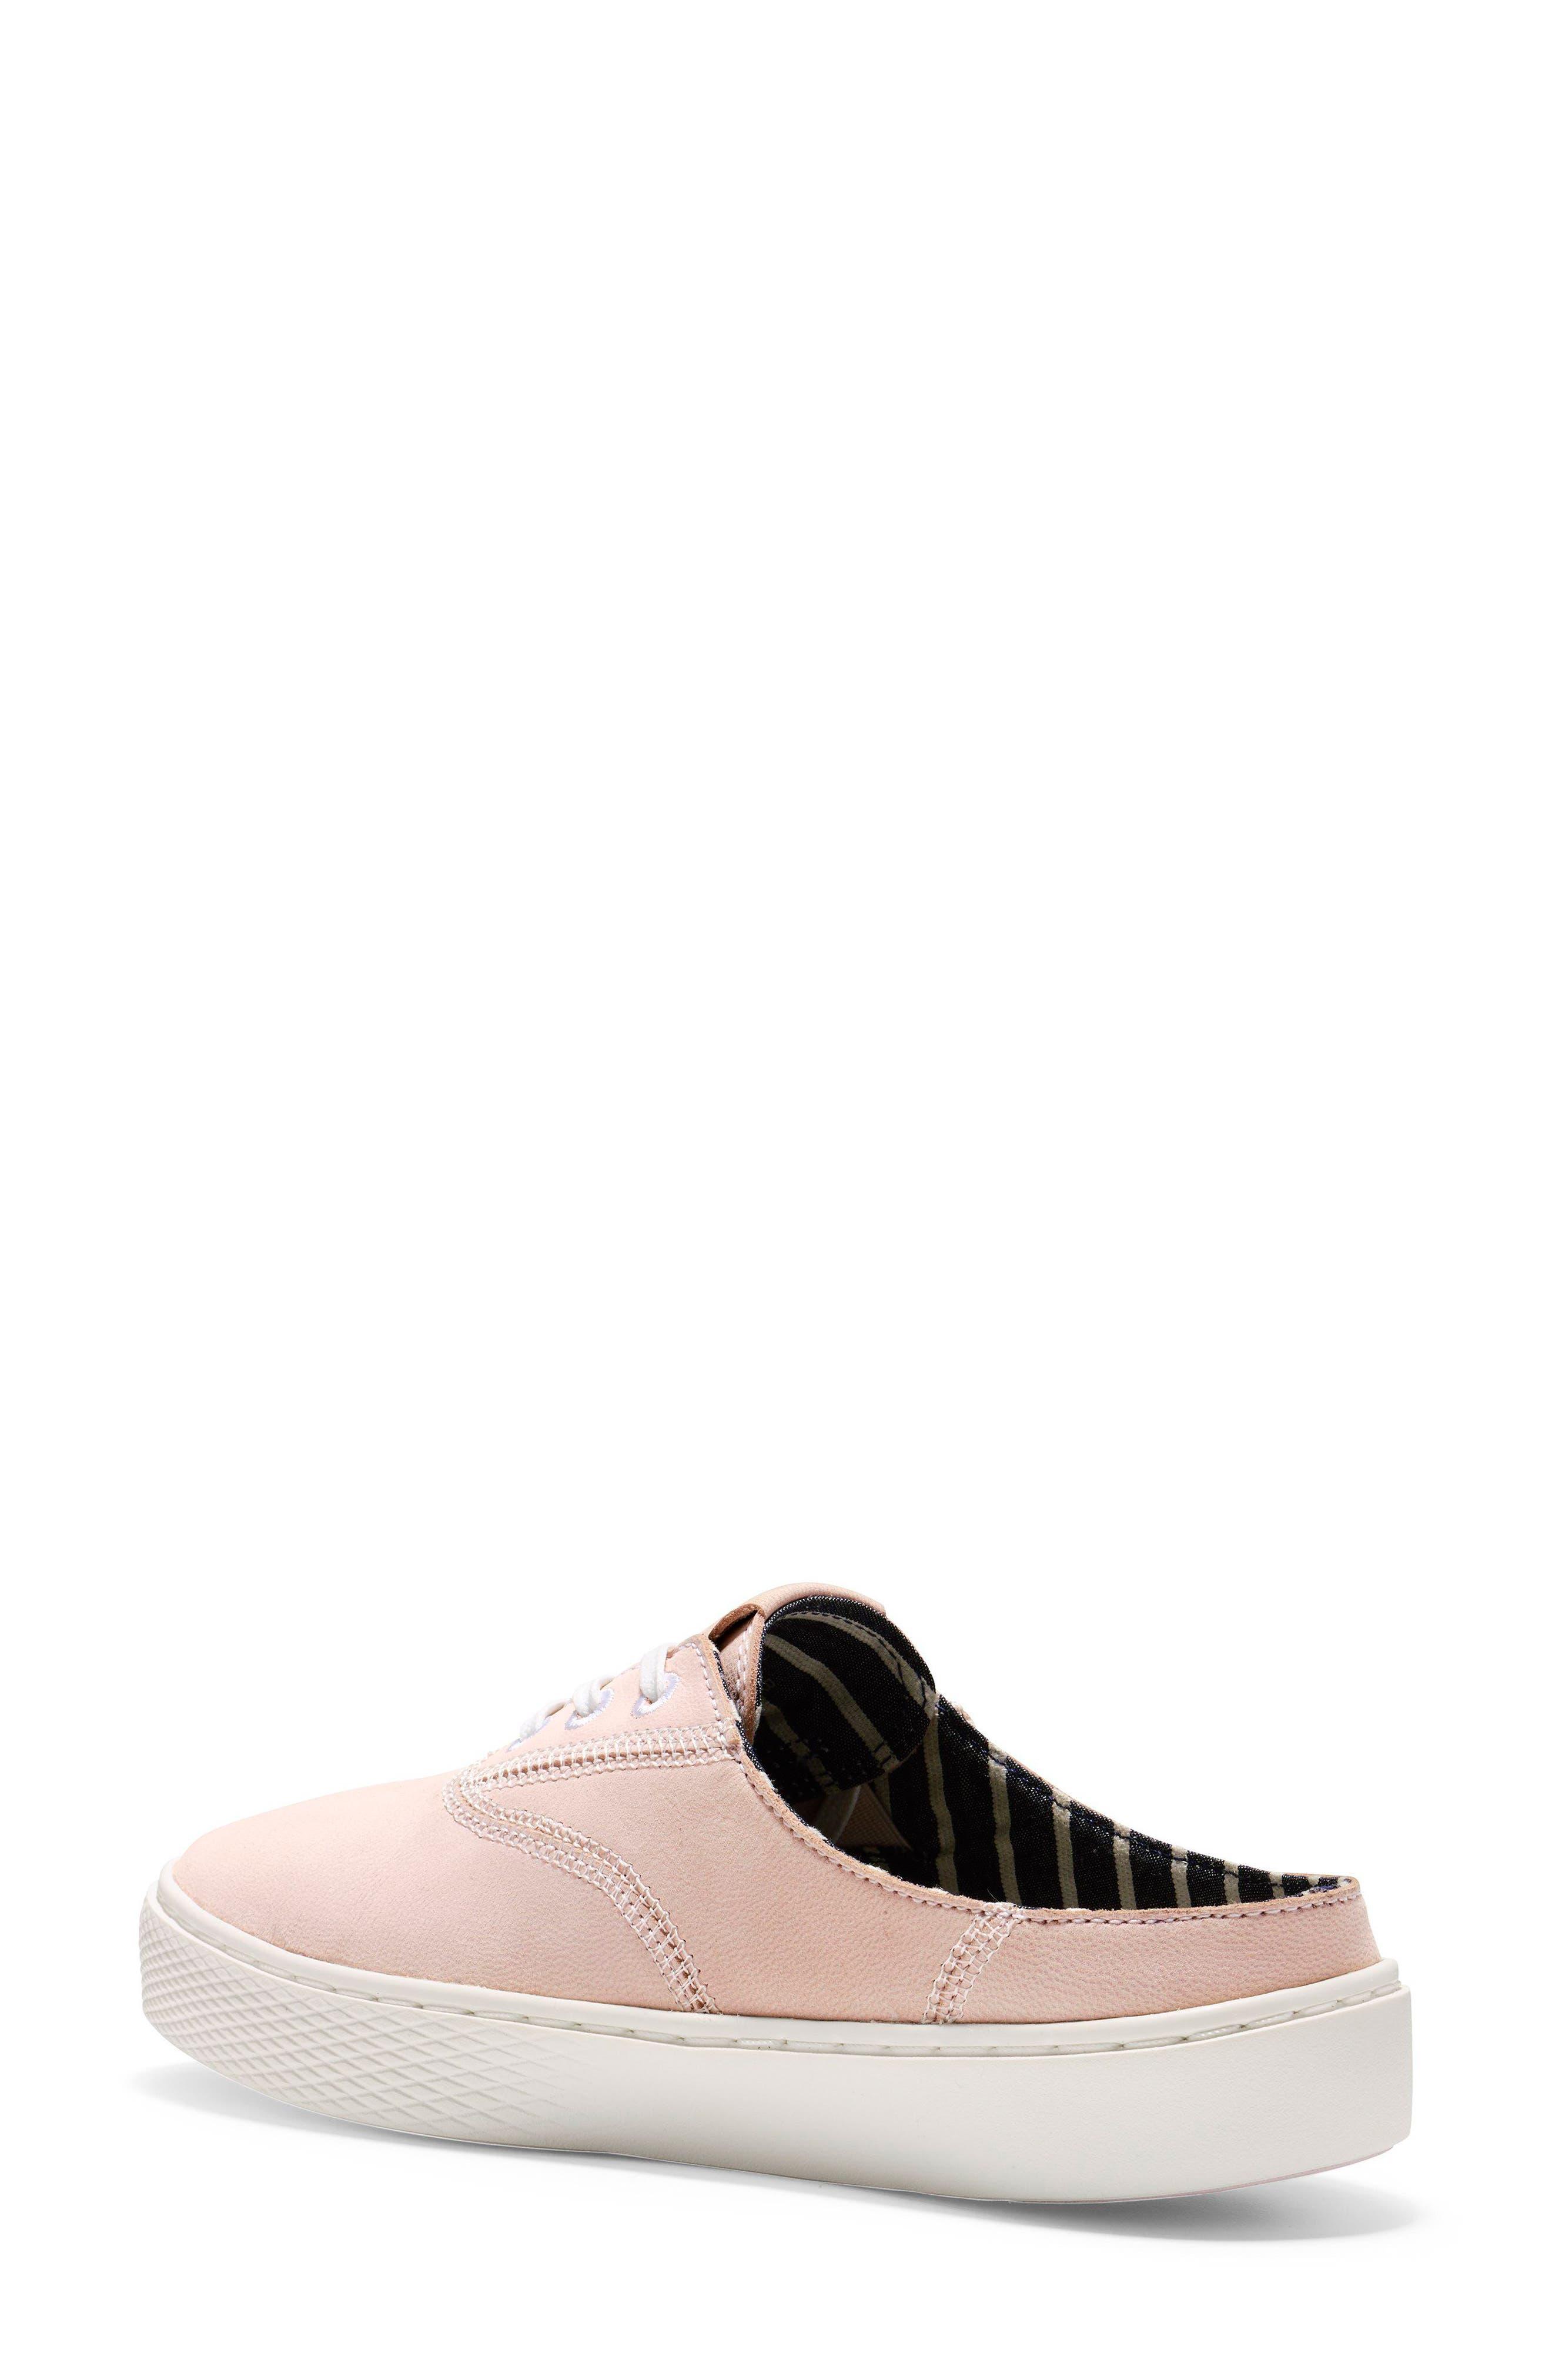 GrandPro Deck Sneaker,                             Alternate thumbnail 2, color,                             PETAL/ OPTIC WHITE NUBUCK